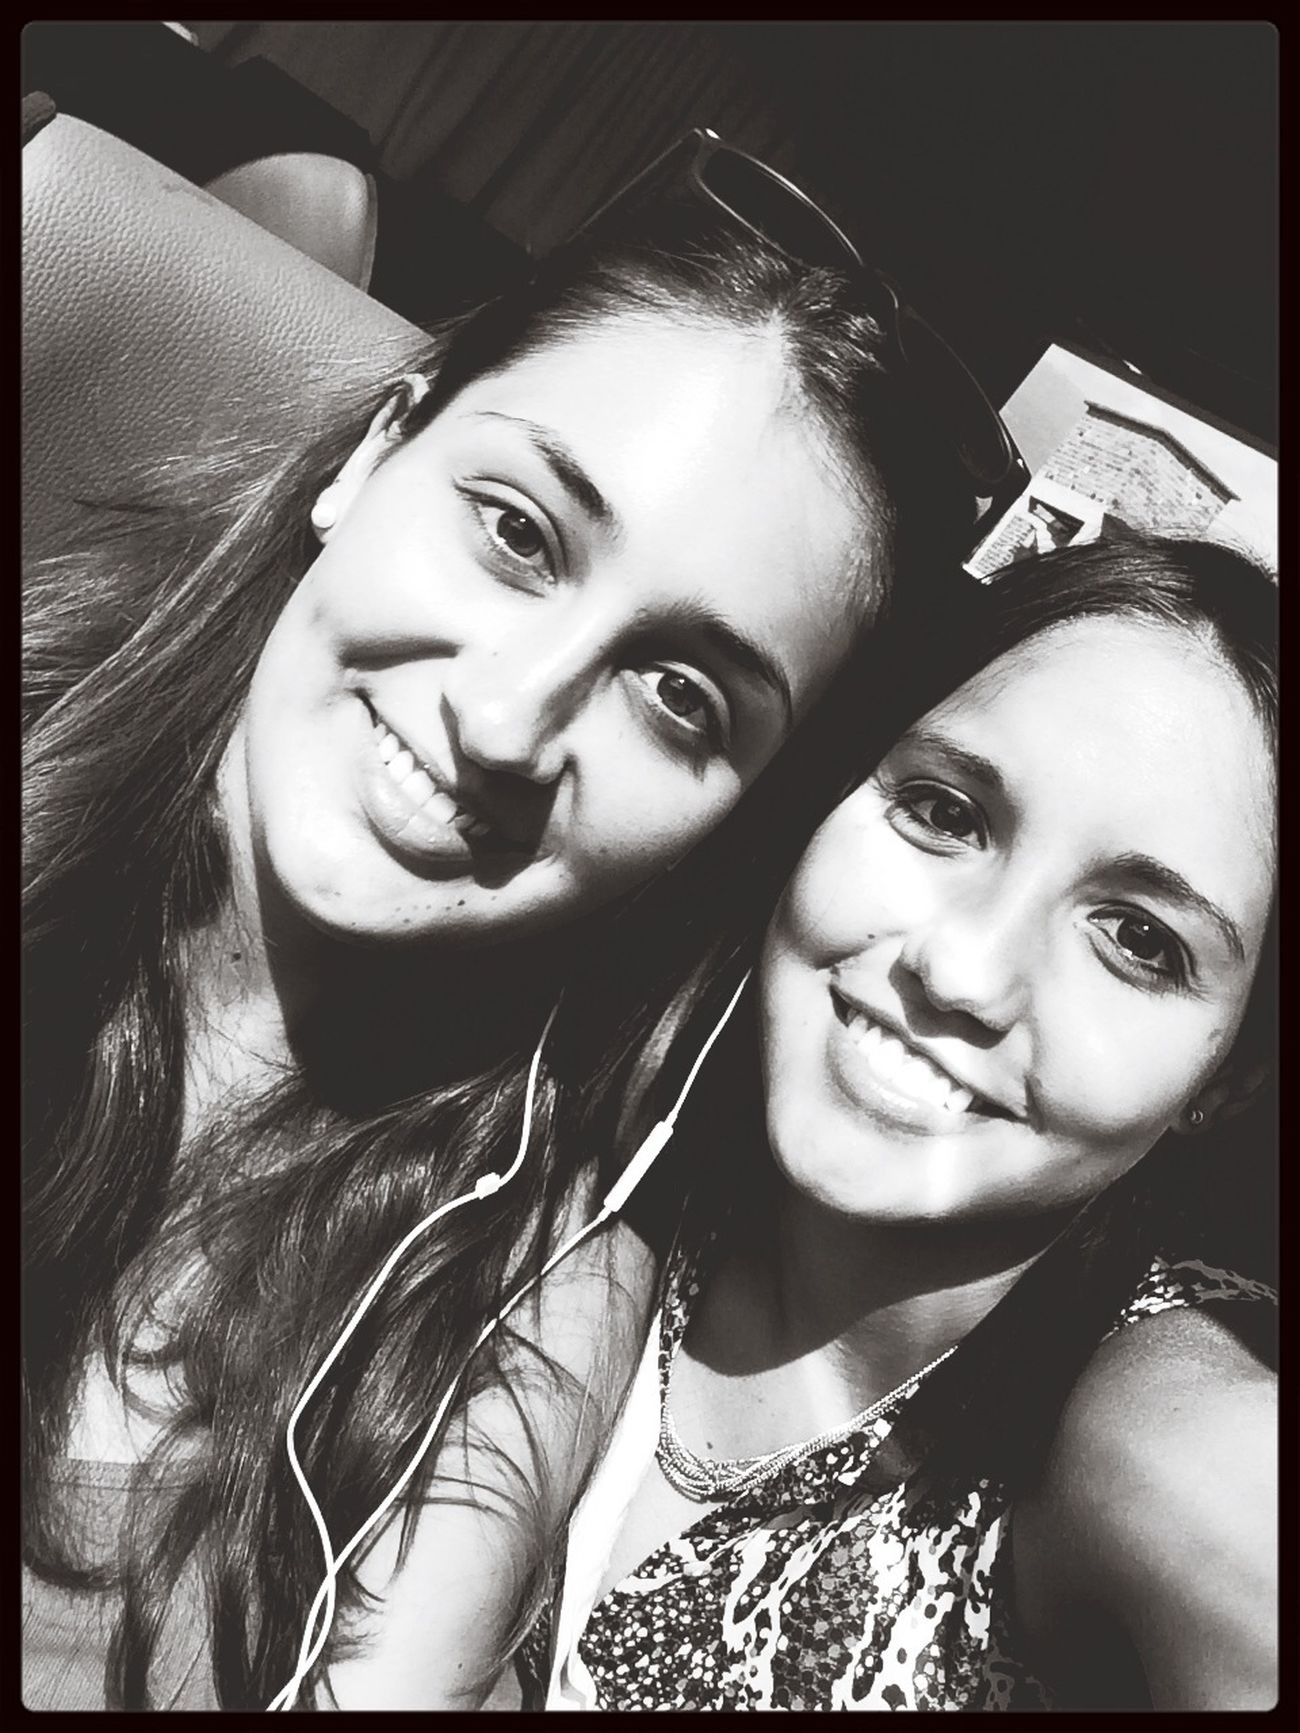 Smile Bestfriend Home Black&white